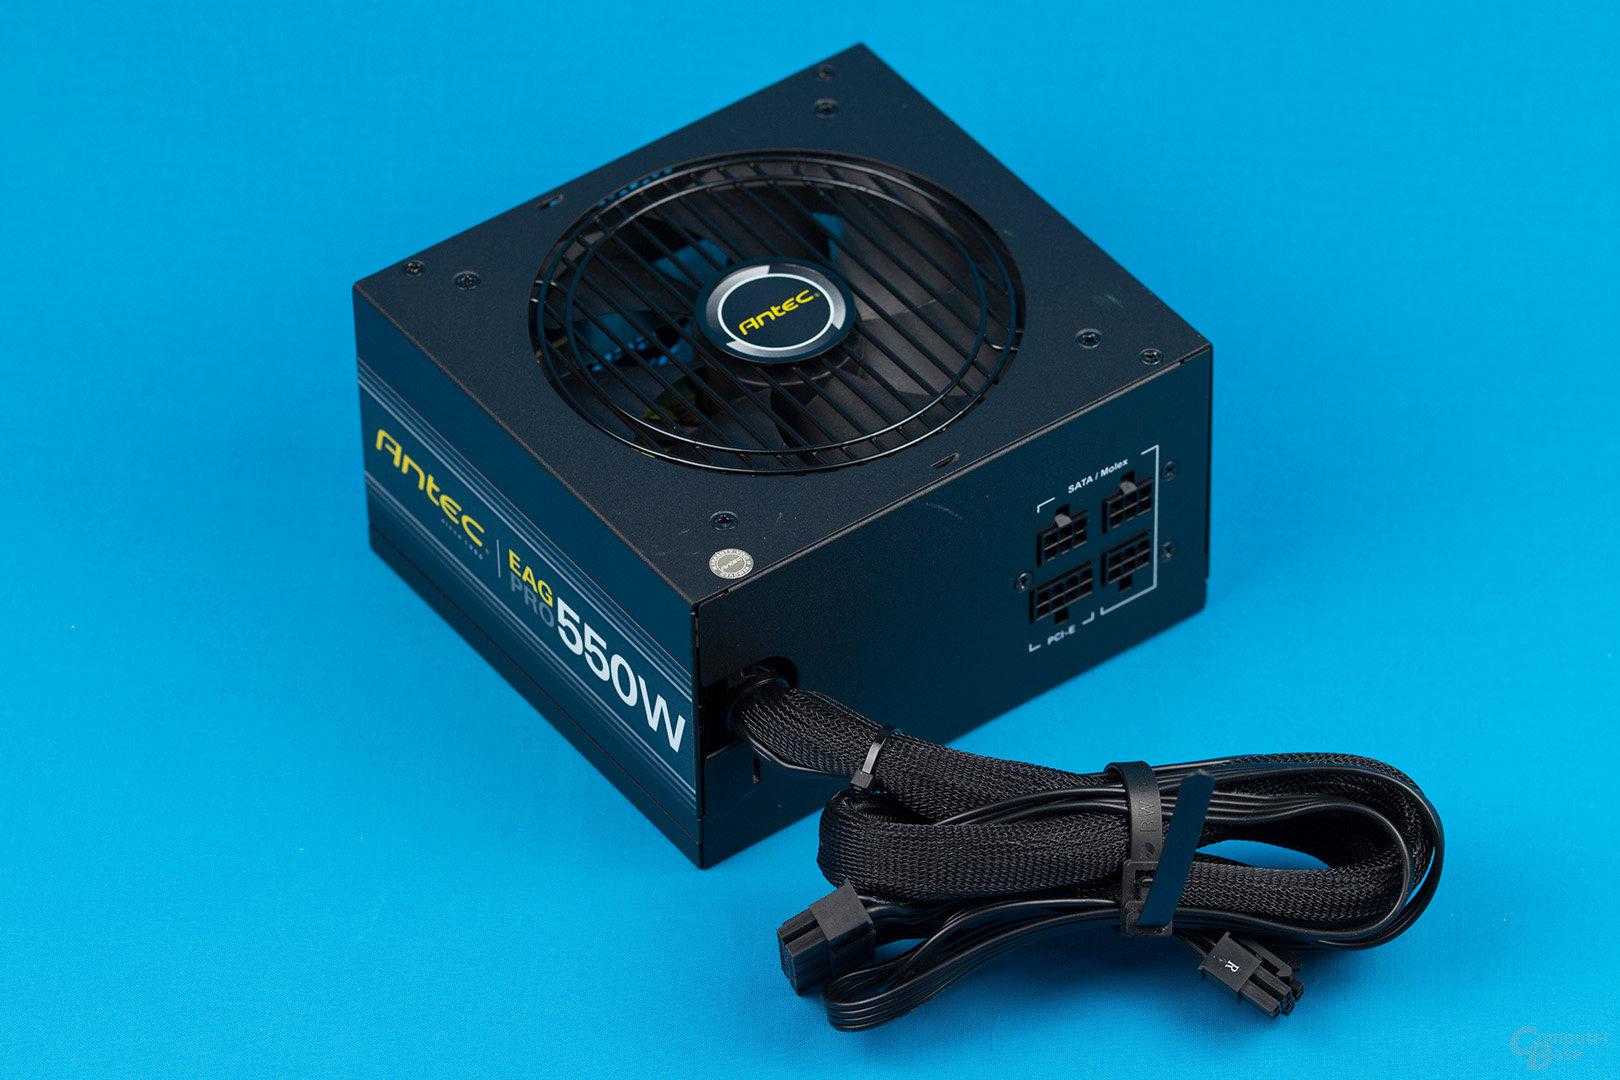 Antec EarthWatts Gold Pro 550W